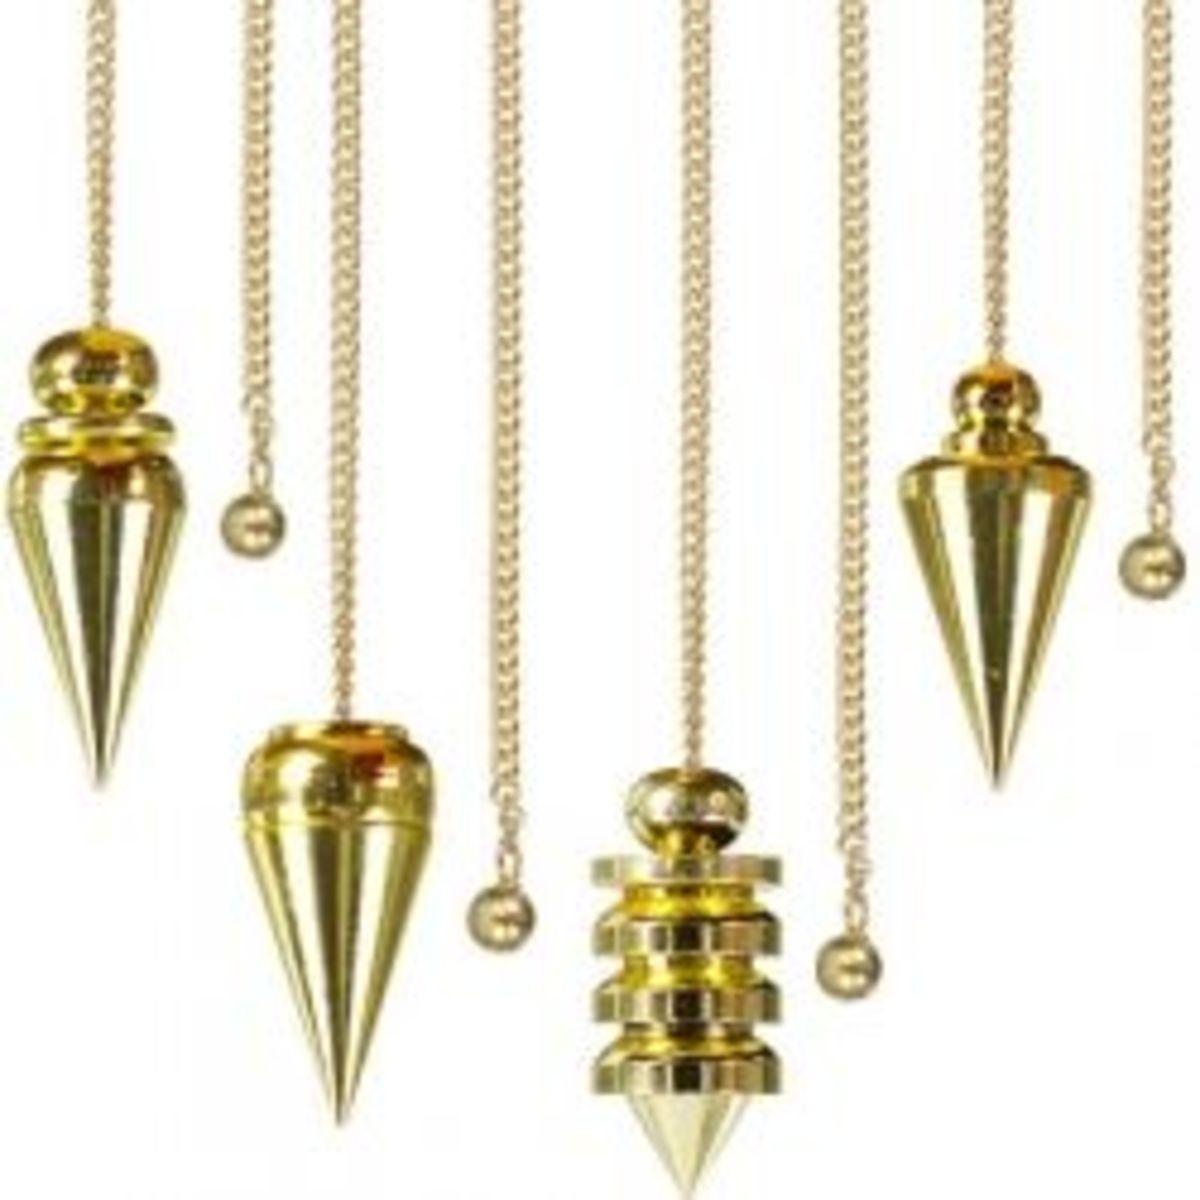 Pendulum Dowsing: Dowsing for Numbers | HubPages